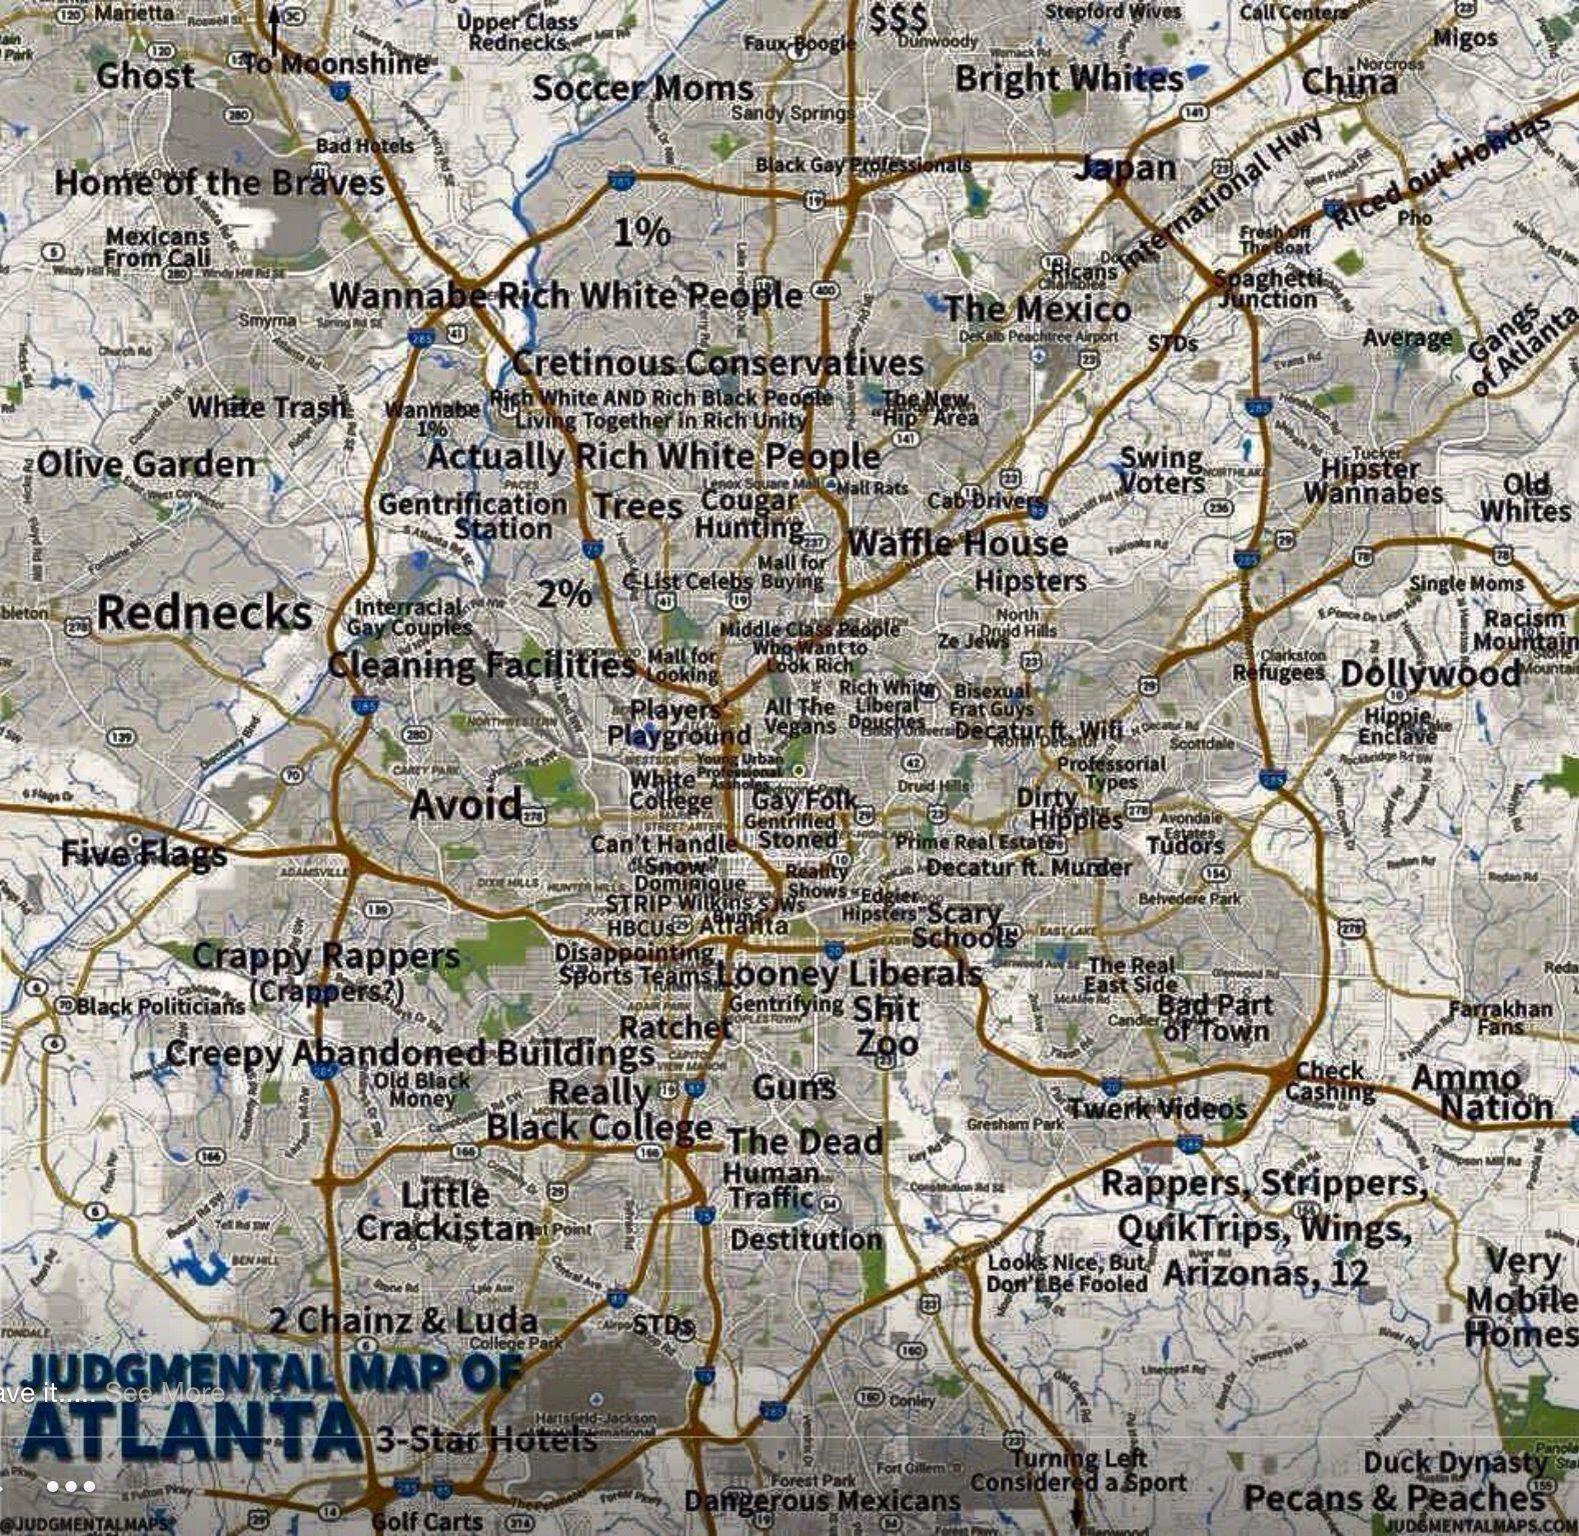 Judgemental map of Atlanta | Mr. Toad\'s Wild Ride | Pinterest